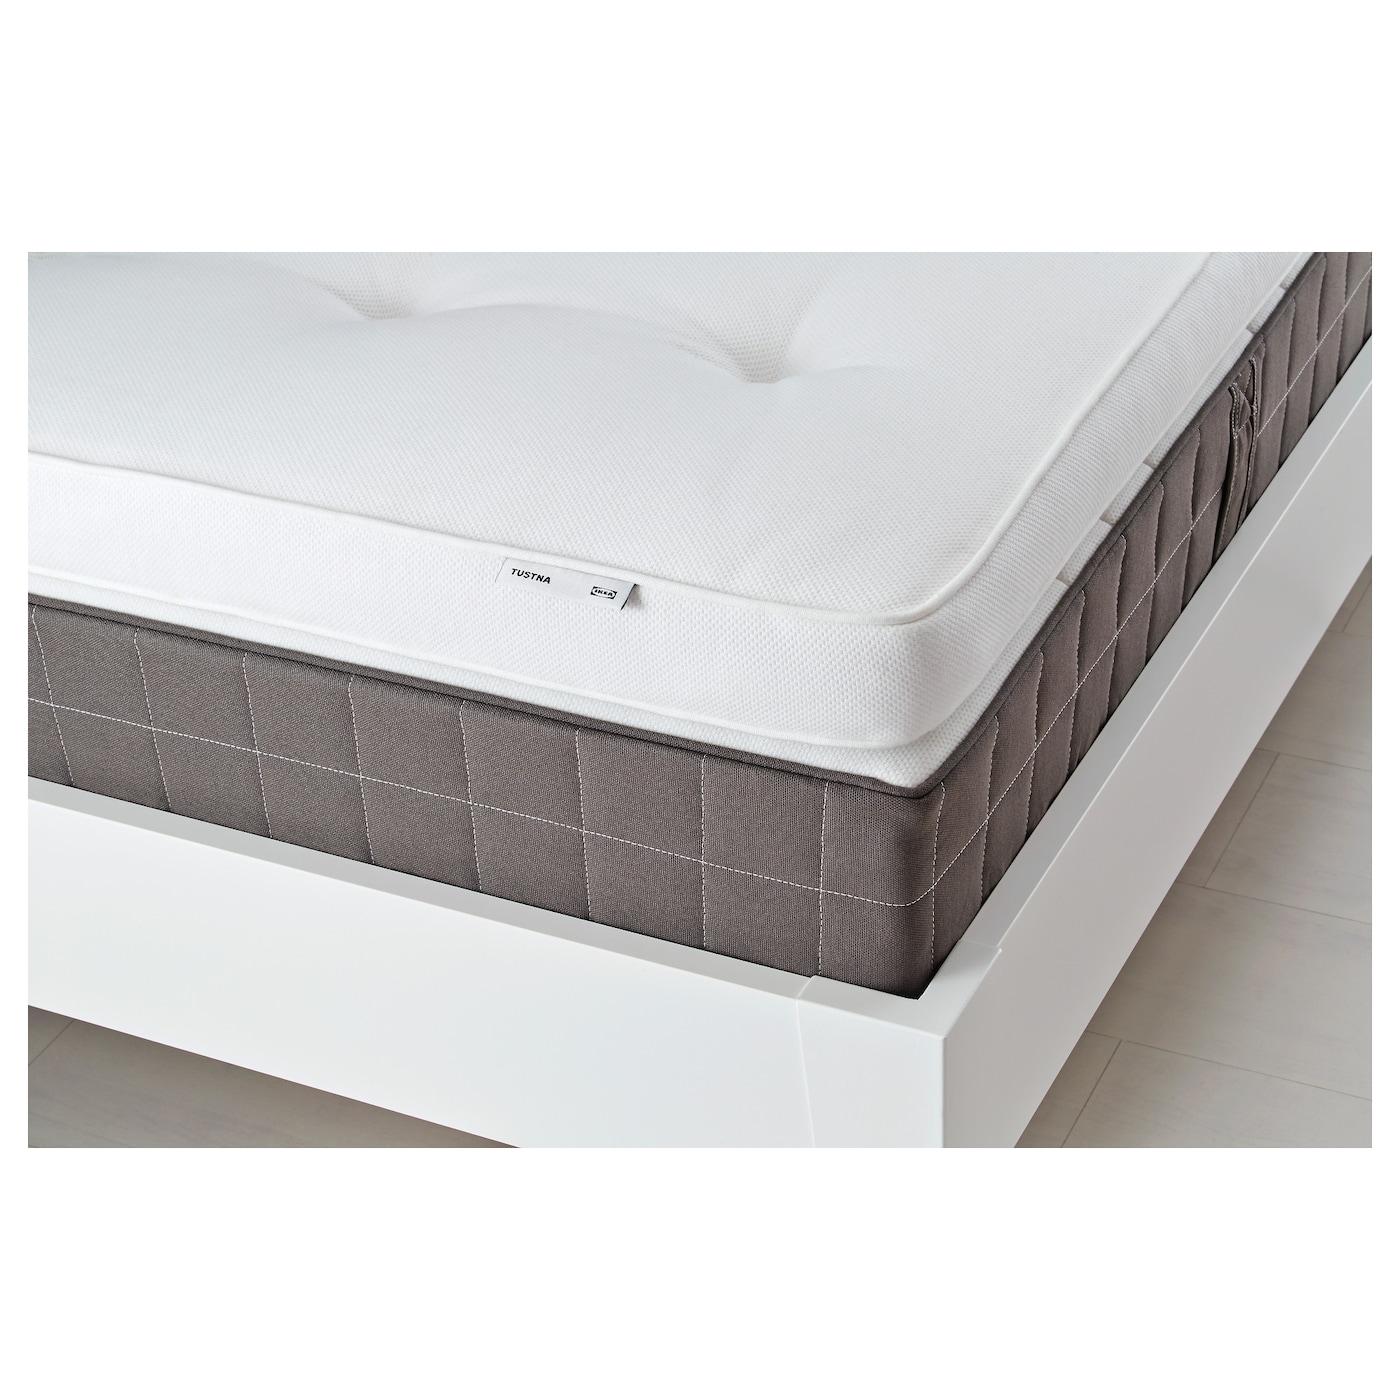 TUSTNA Mattress topper White Standard Double IKEA